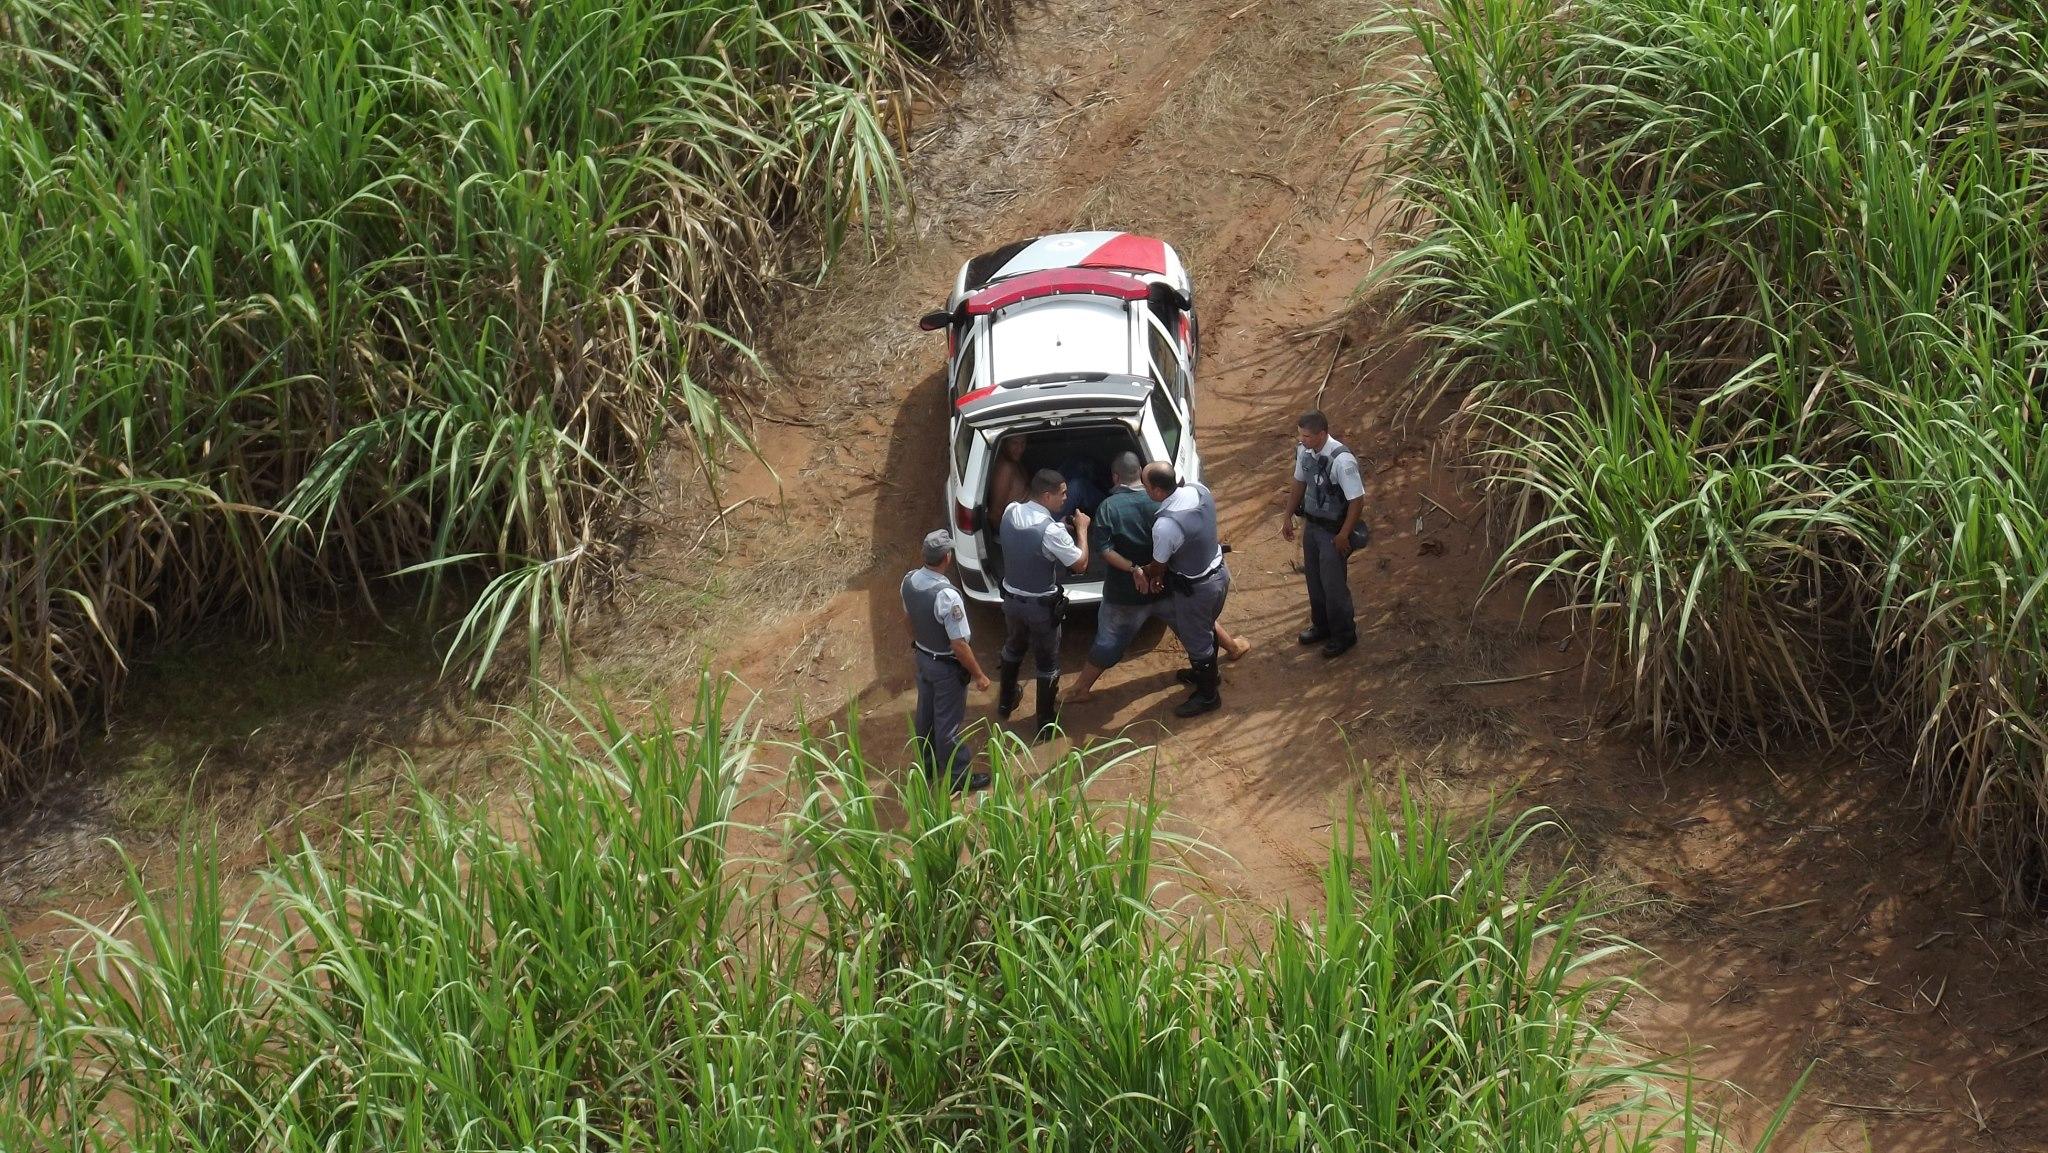 BRPAe Presidente Prudente apoia prisão de contrabandistas